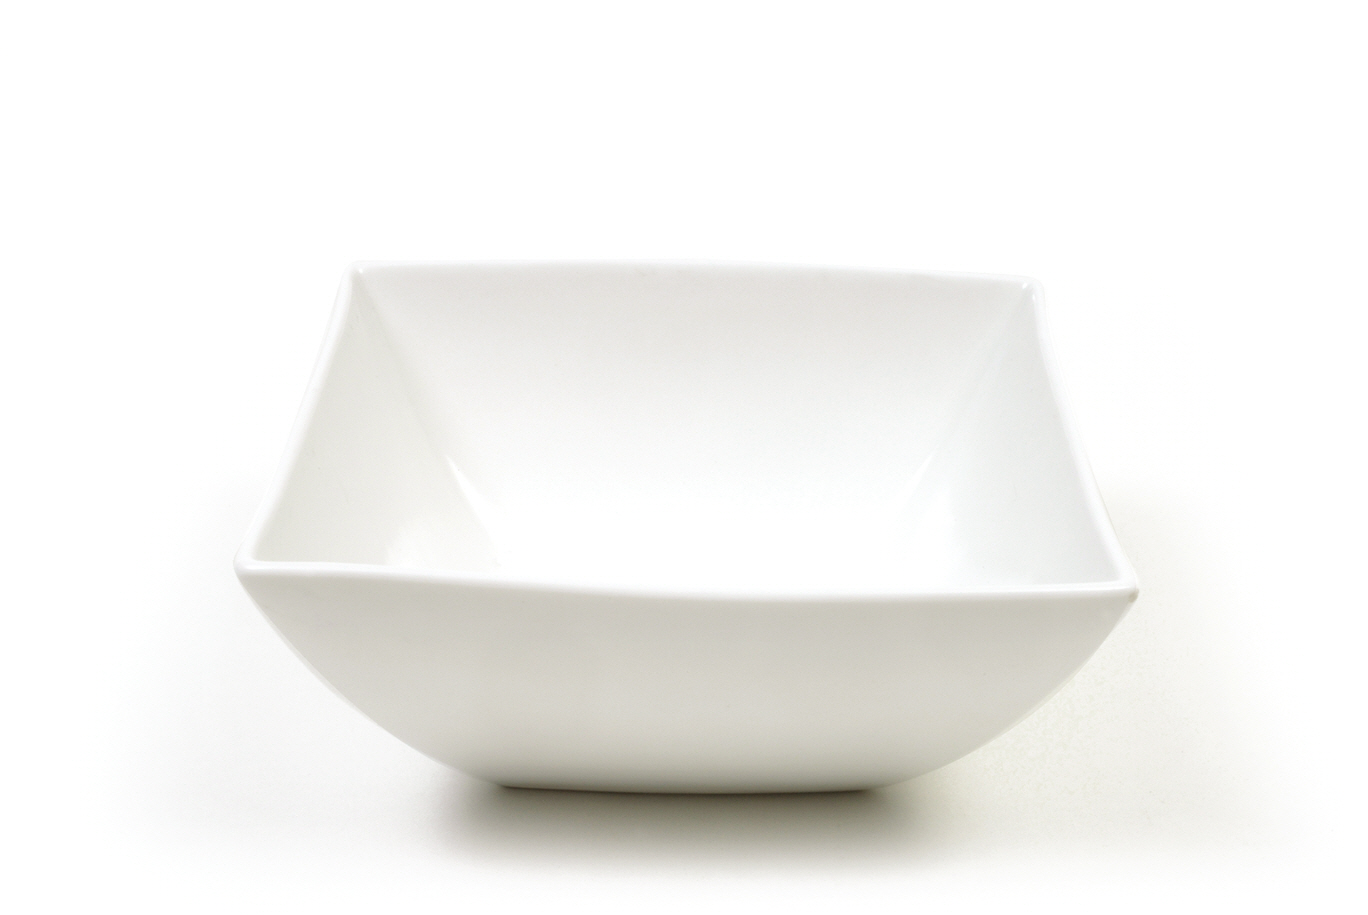 Čtvercová polévková miska East Meets West 16 x 16 cm - Maxwell&Williams